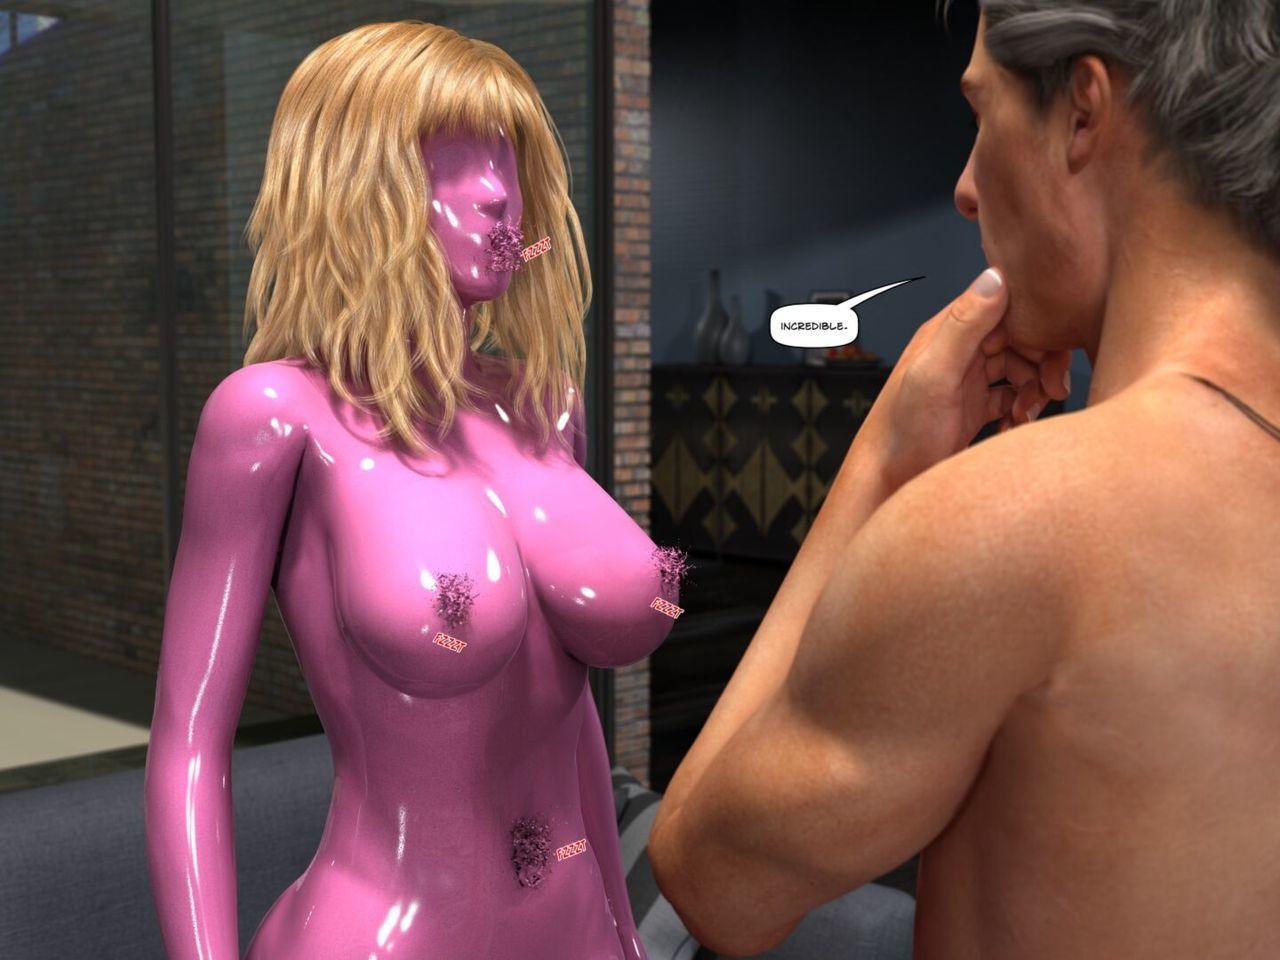 [Telsis] The Sex Toy - part 3